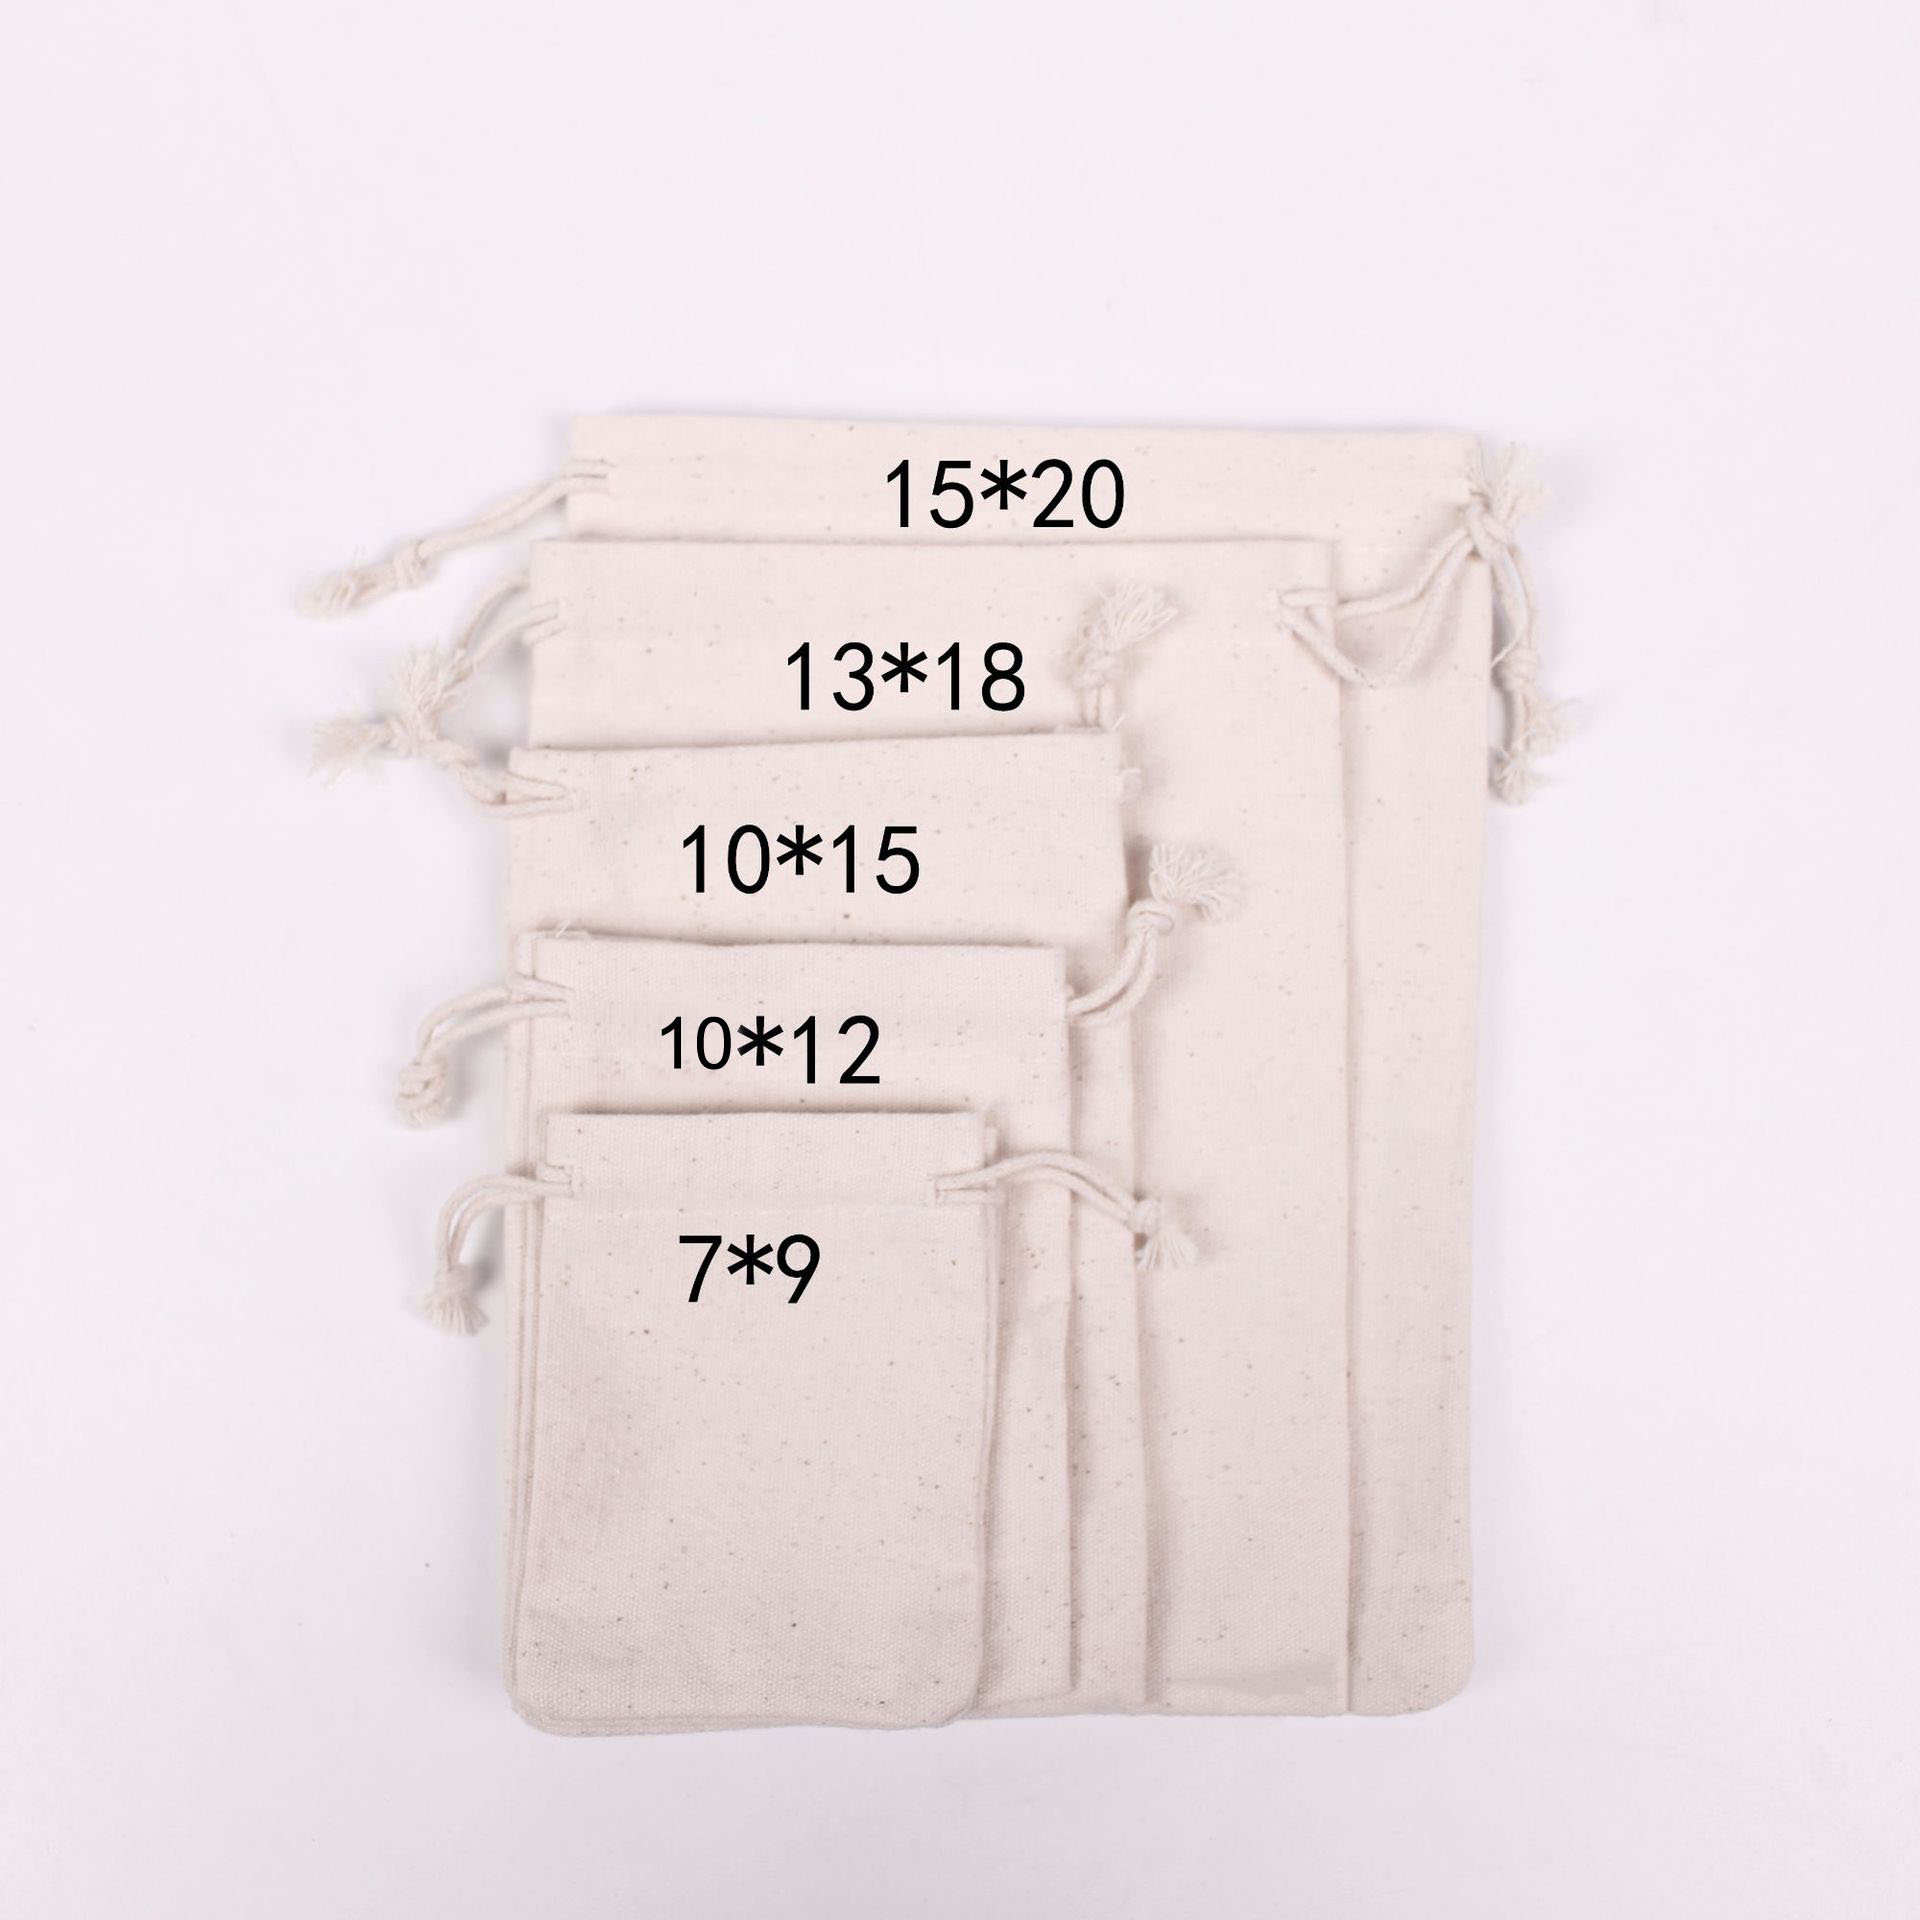 50pcs/lot 7x9/10x12/10x15/13x18/15x20cm Drawstring Natural Canvas Cotton Bags & Pouches For Food Packing Bag Custom Print Logo